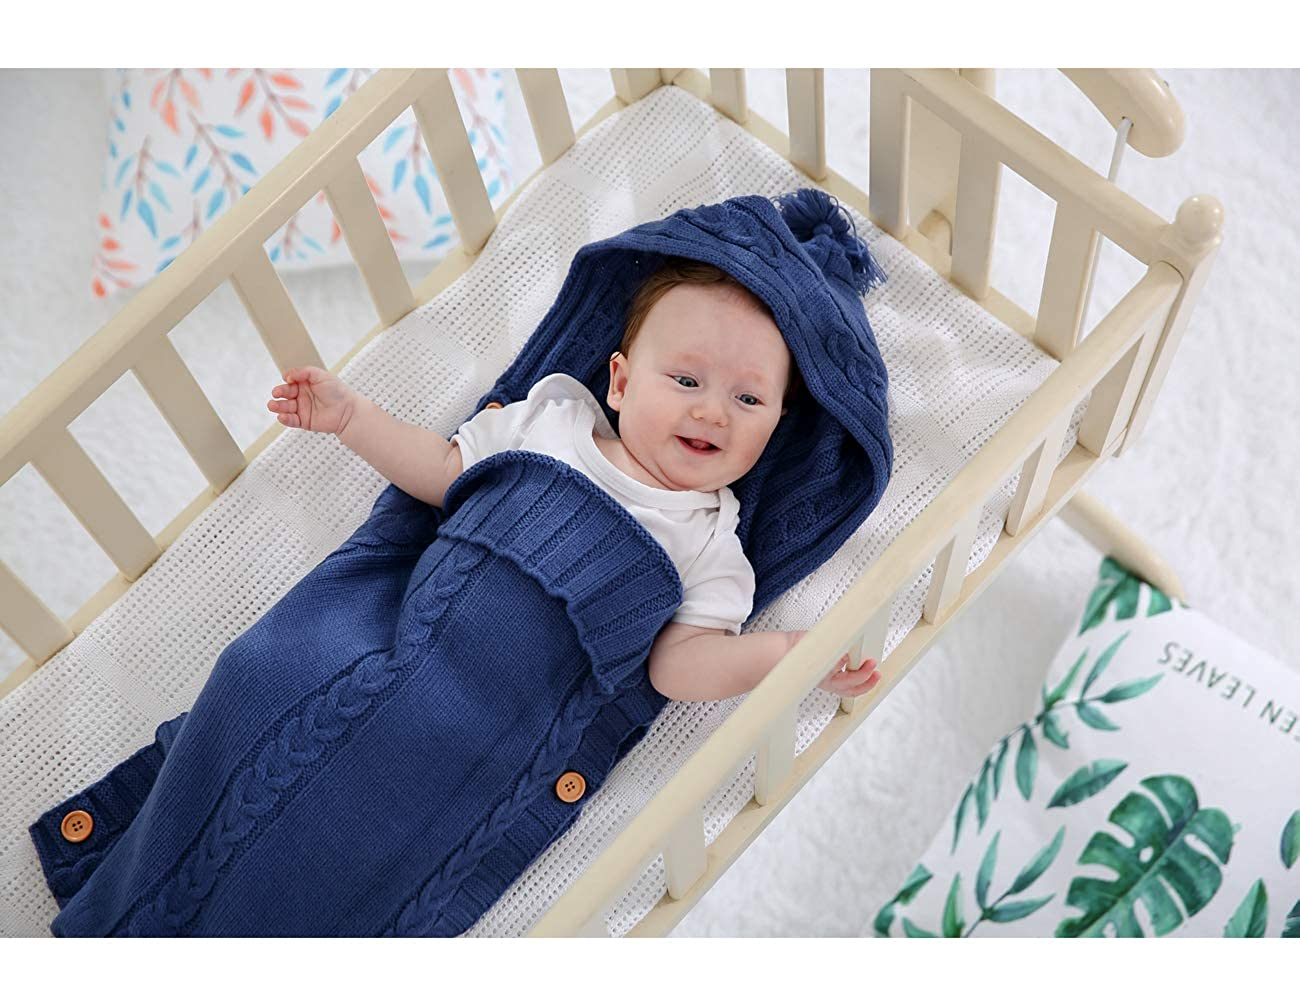 XMWEALTHY Infants Baby Blankets Cute Newborn Baby Girls Swaddle Blankets Toddler Boys Blankets Newborn Gifts 0-6 M ICECHO089-LPINK